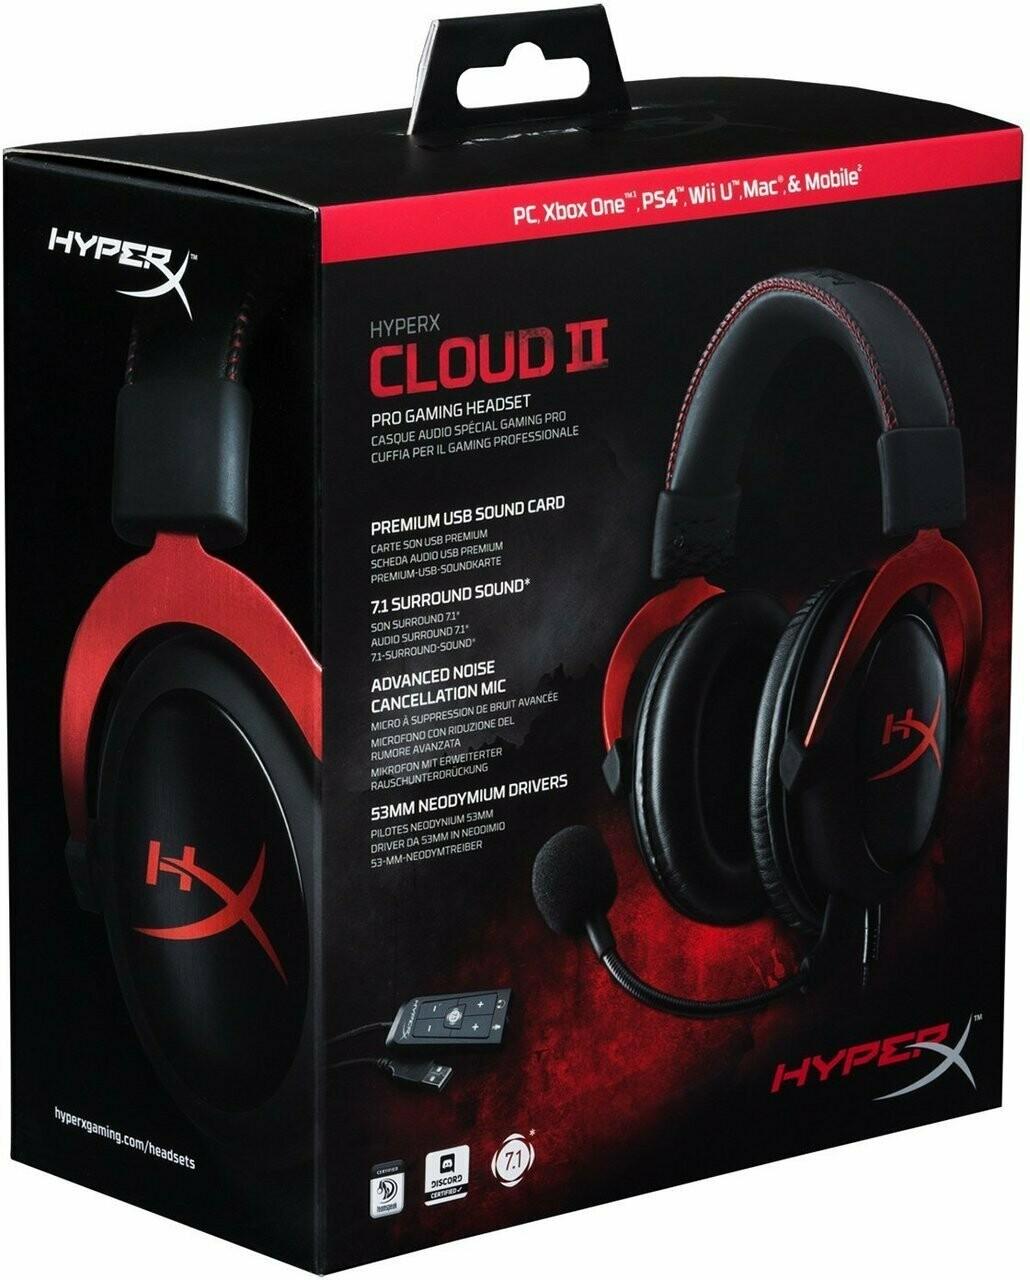 HyperX Cloud II Gaming Headset - 7.1 Surround Sound - Memory Foam Ear Pads - Durable Aluminum Frame - Multi Platform Headset